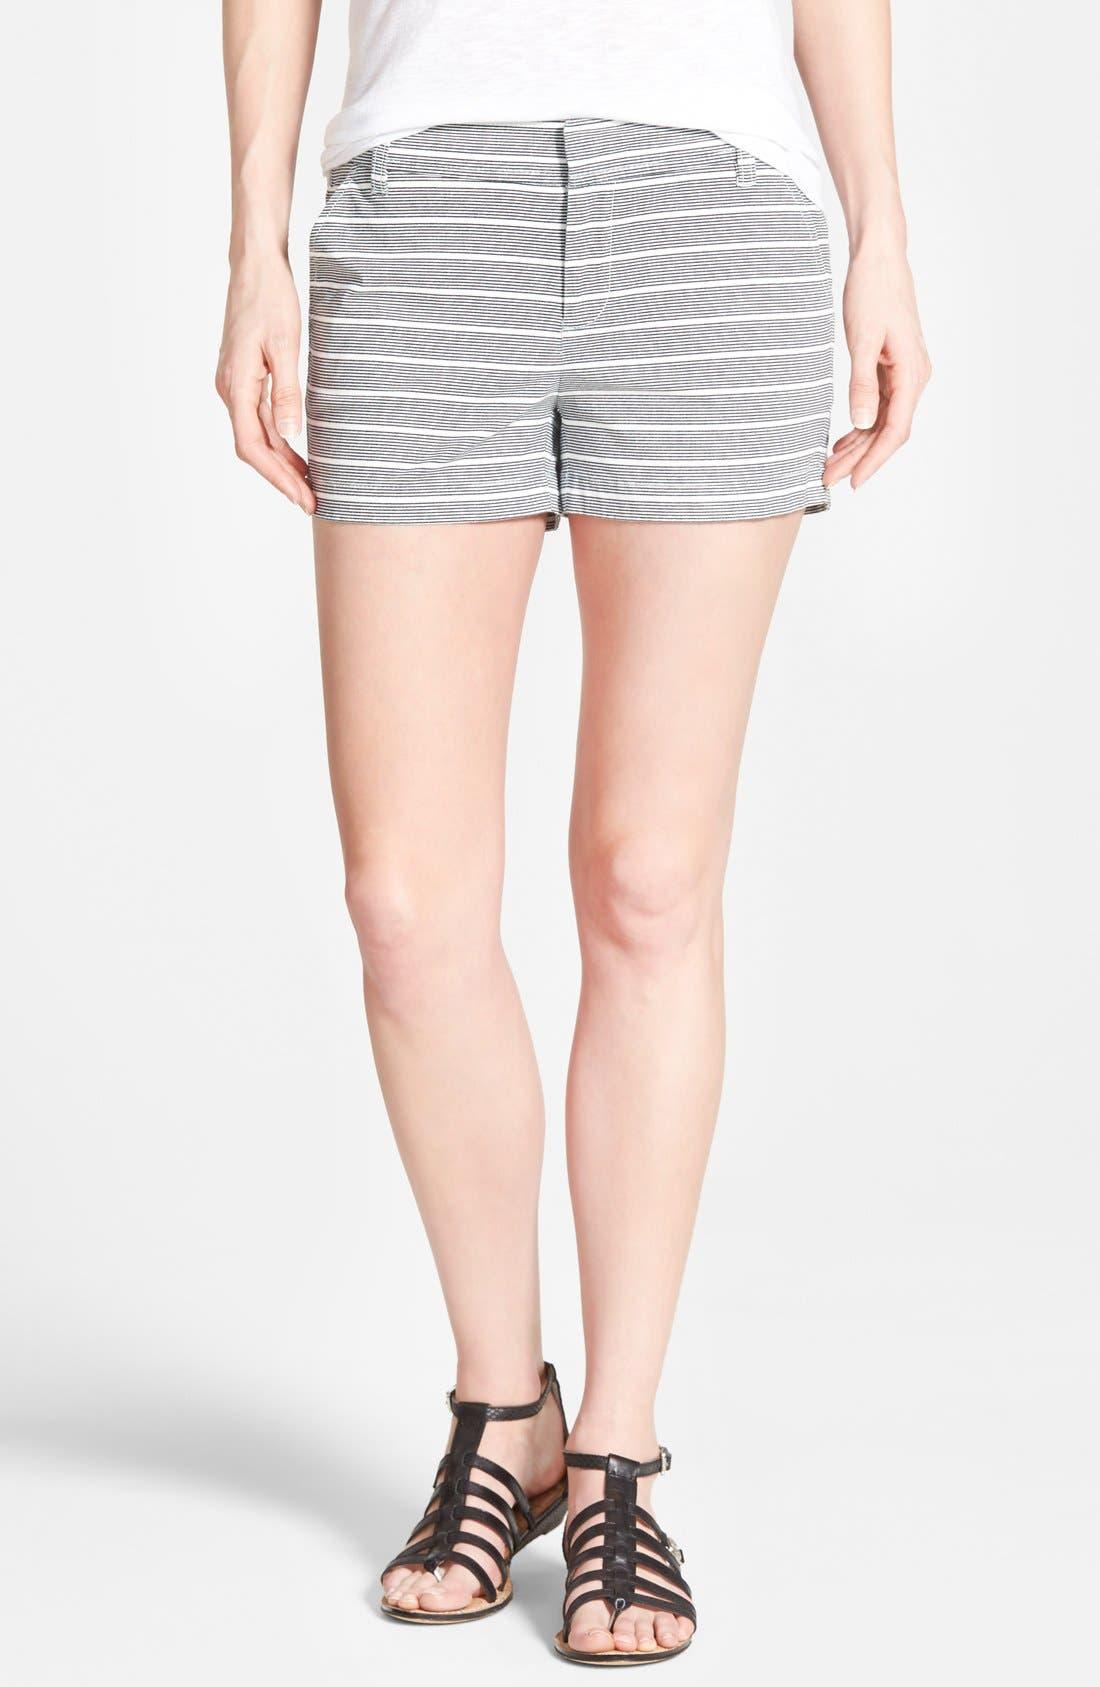 Alternate Image 1 Selected - Caslon® 'Addison' Clean Front Shorts (3 Inch) (Regular & Petite)